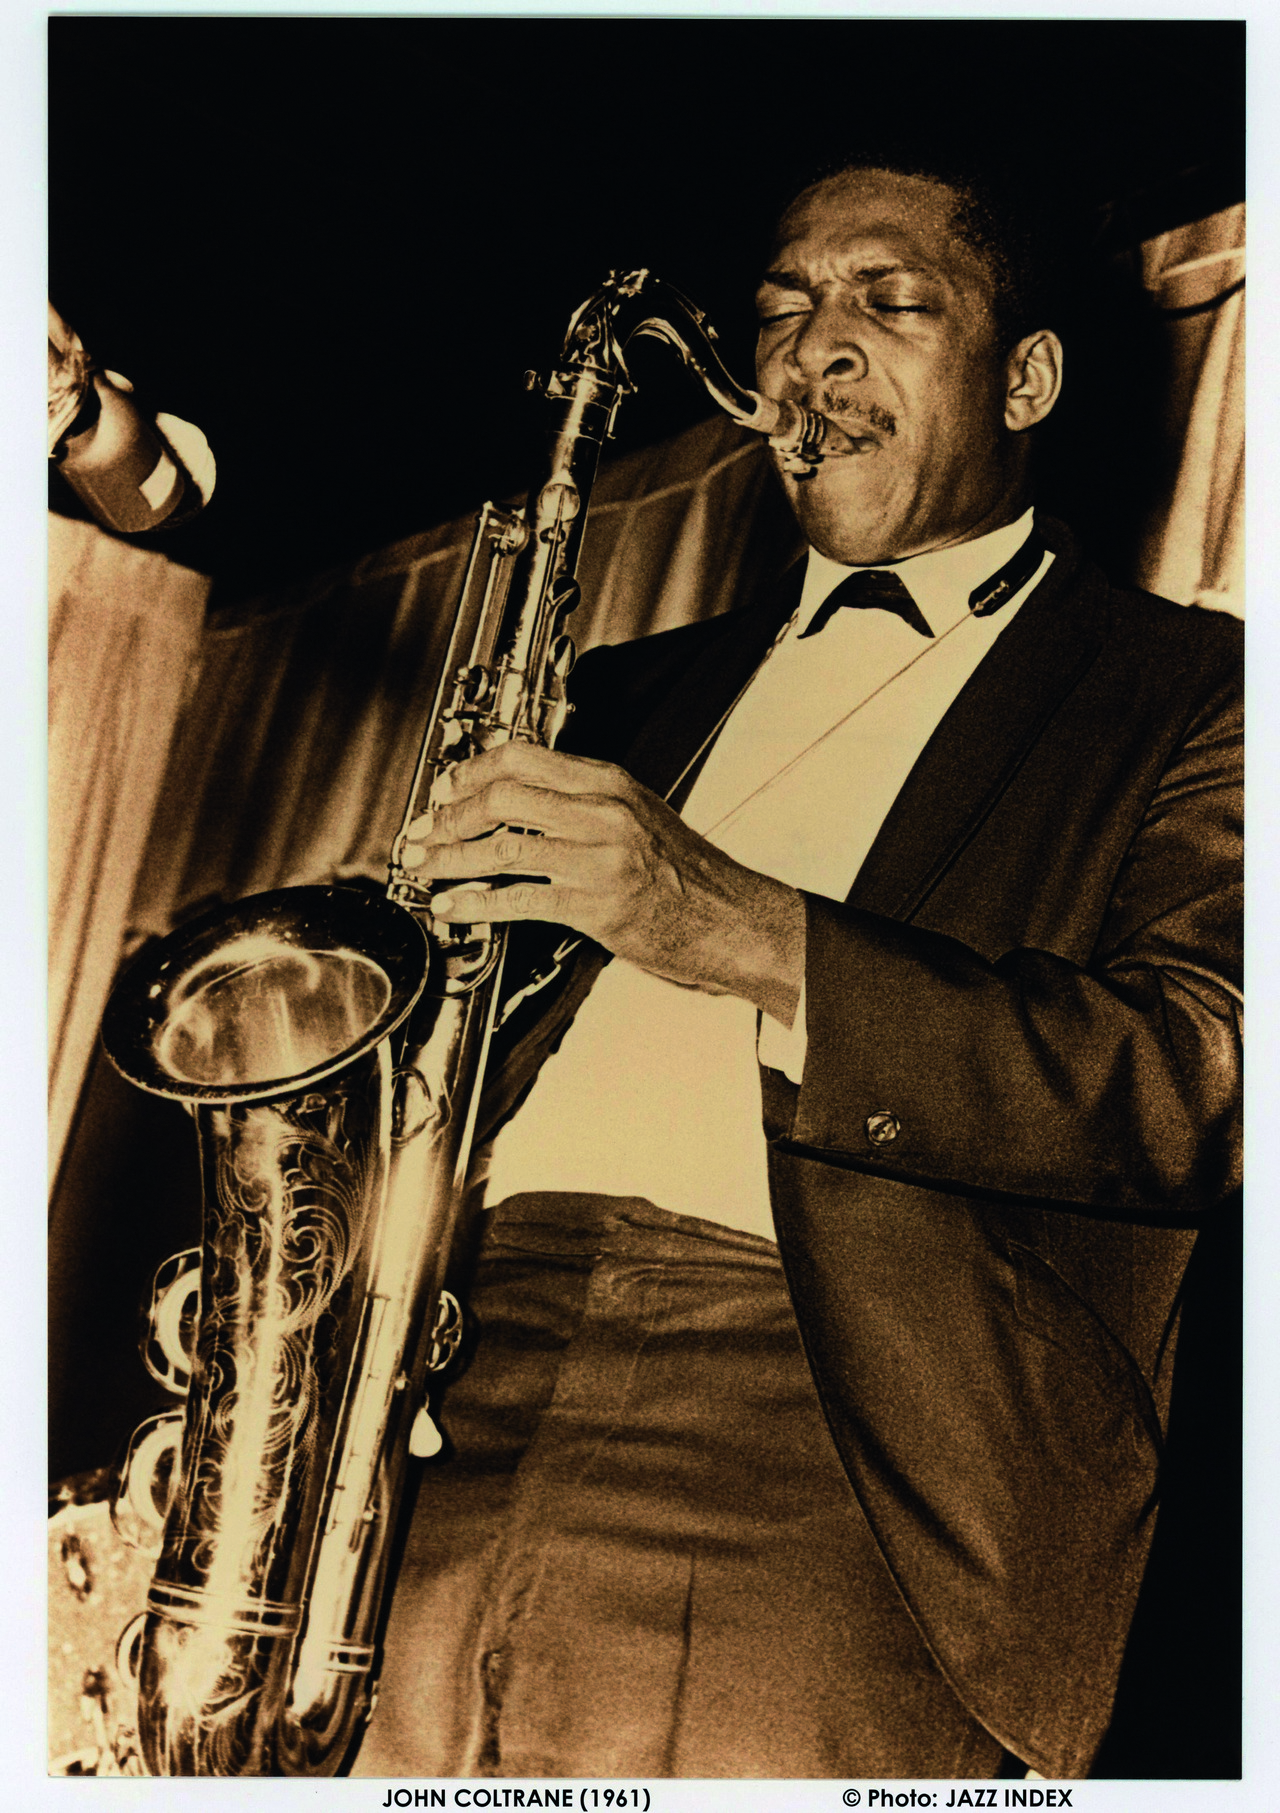 Saxophonist John Coltrane on tenor sax